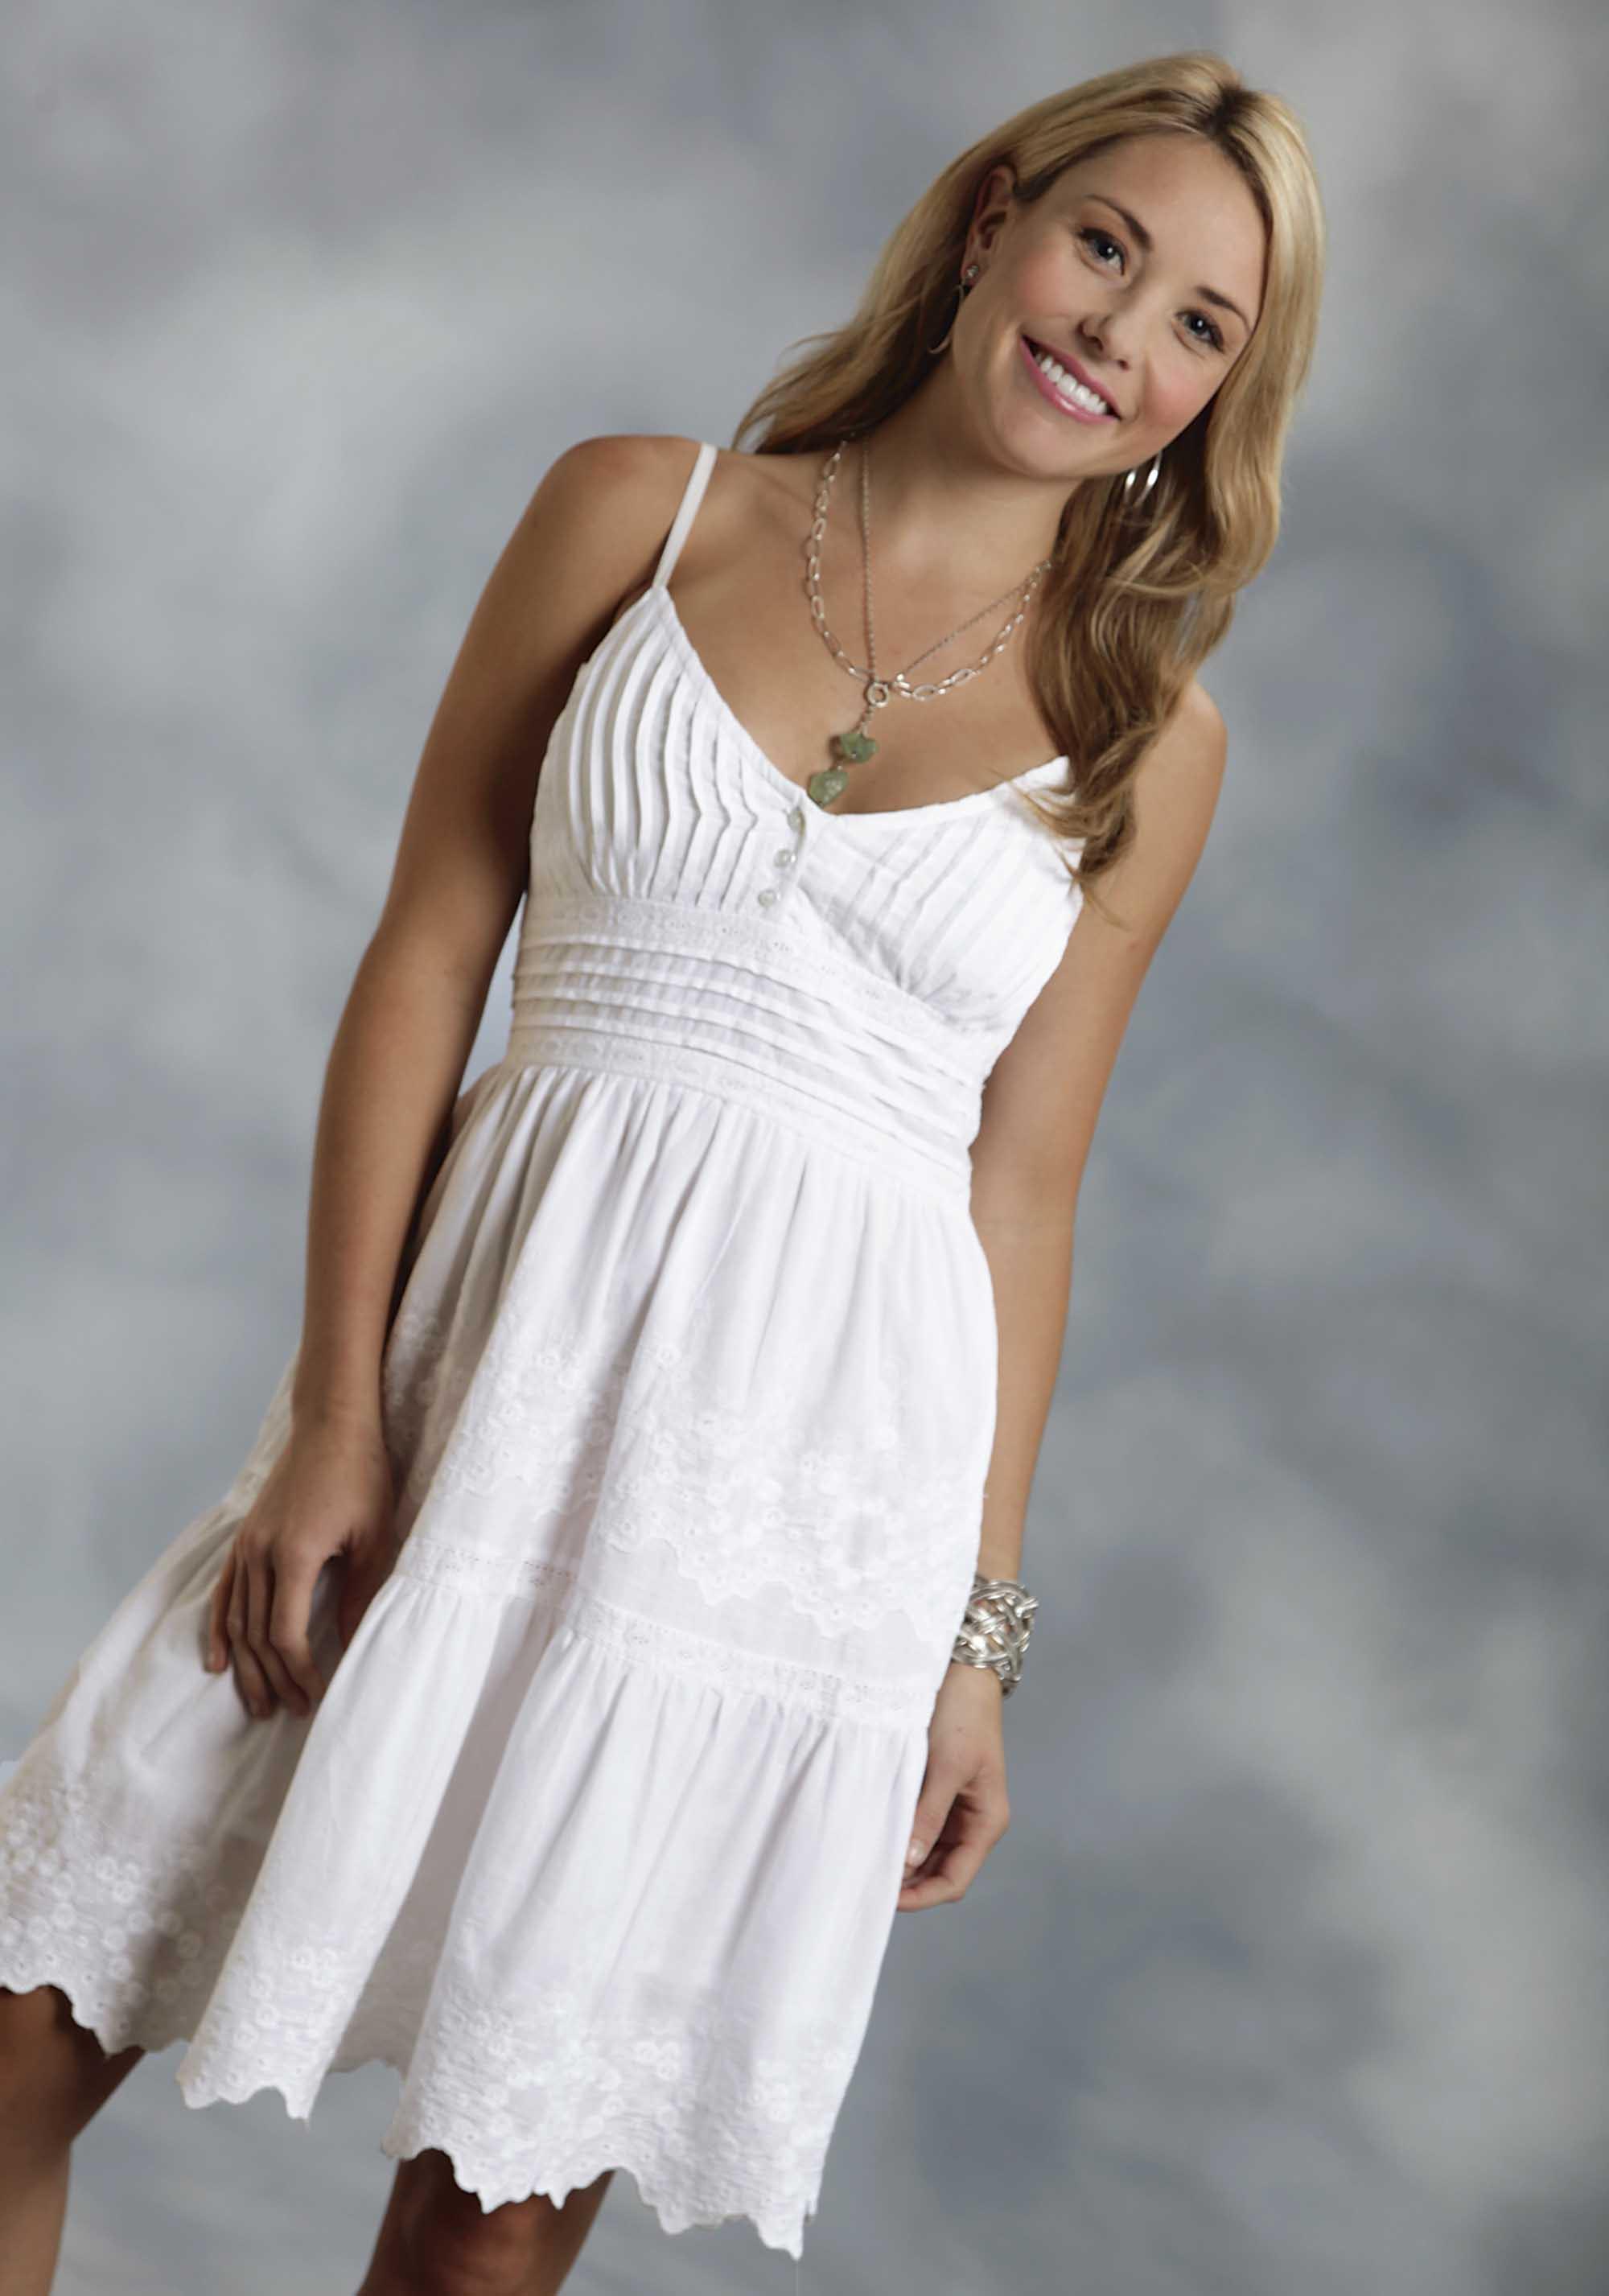 Roper® Women's White Cotton Eyelet Embroidered Western Sundress